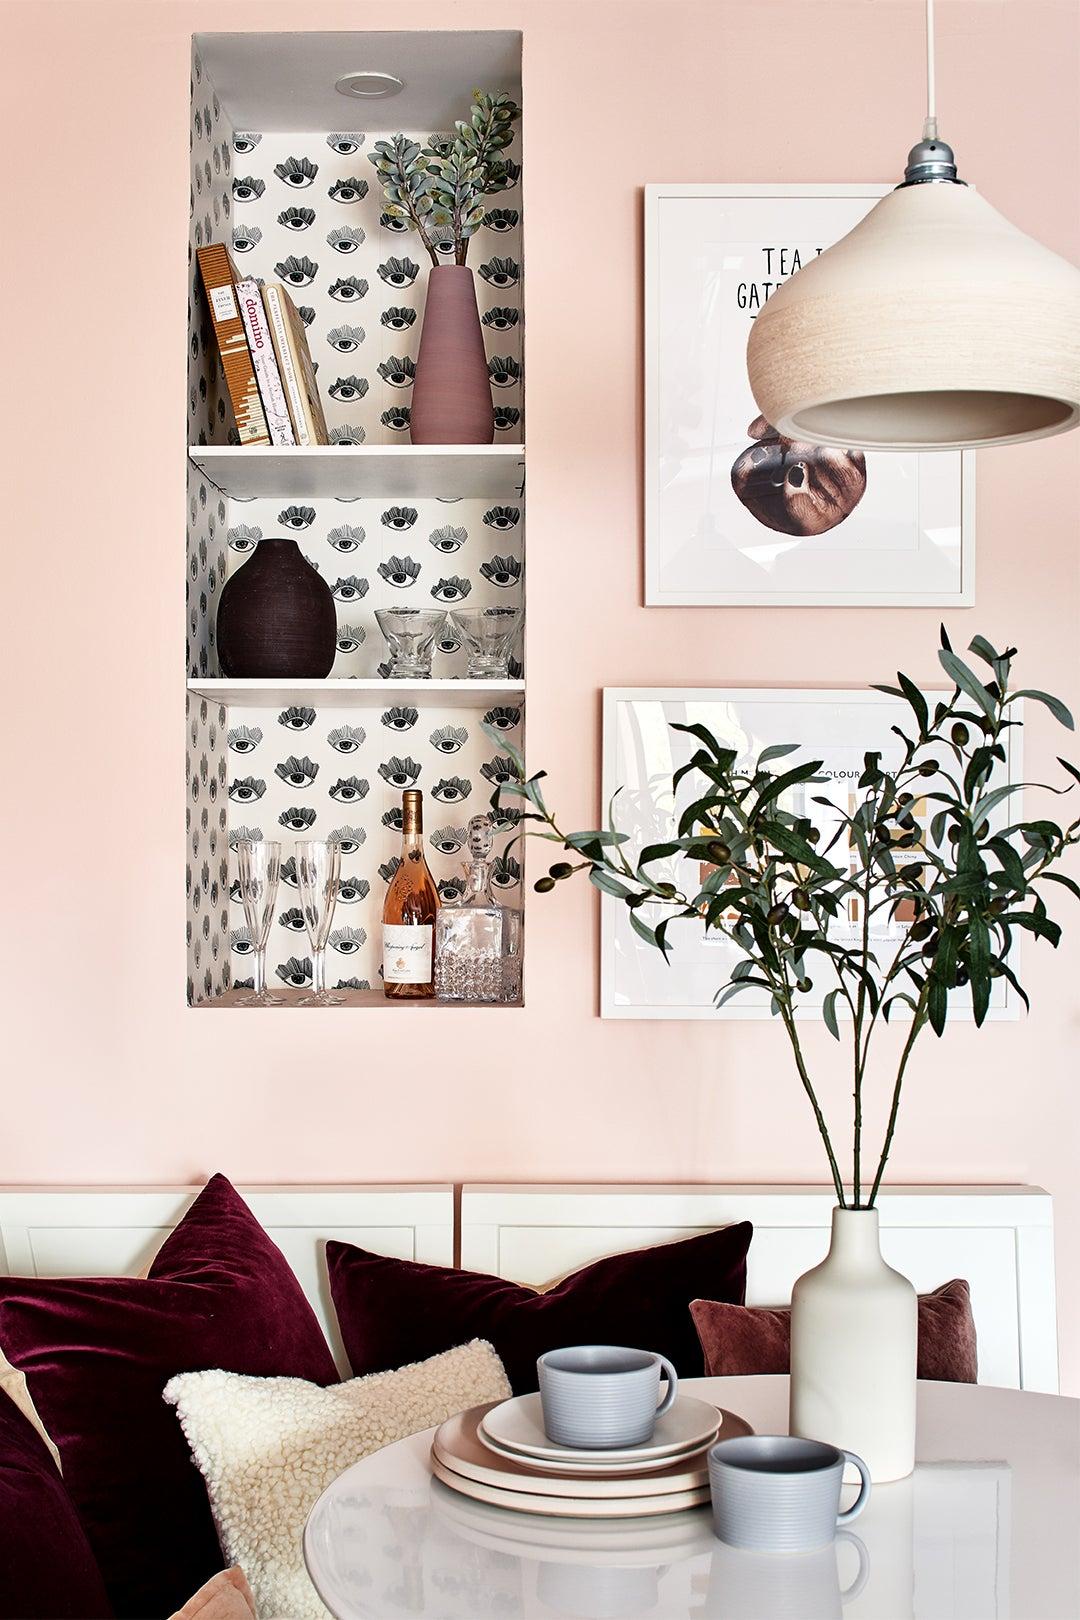 Breakfast nook with wallpapered niche